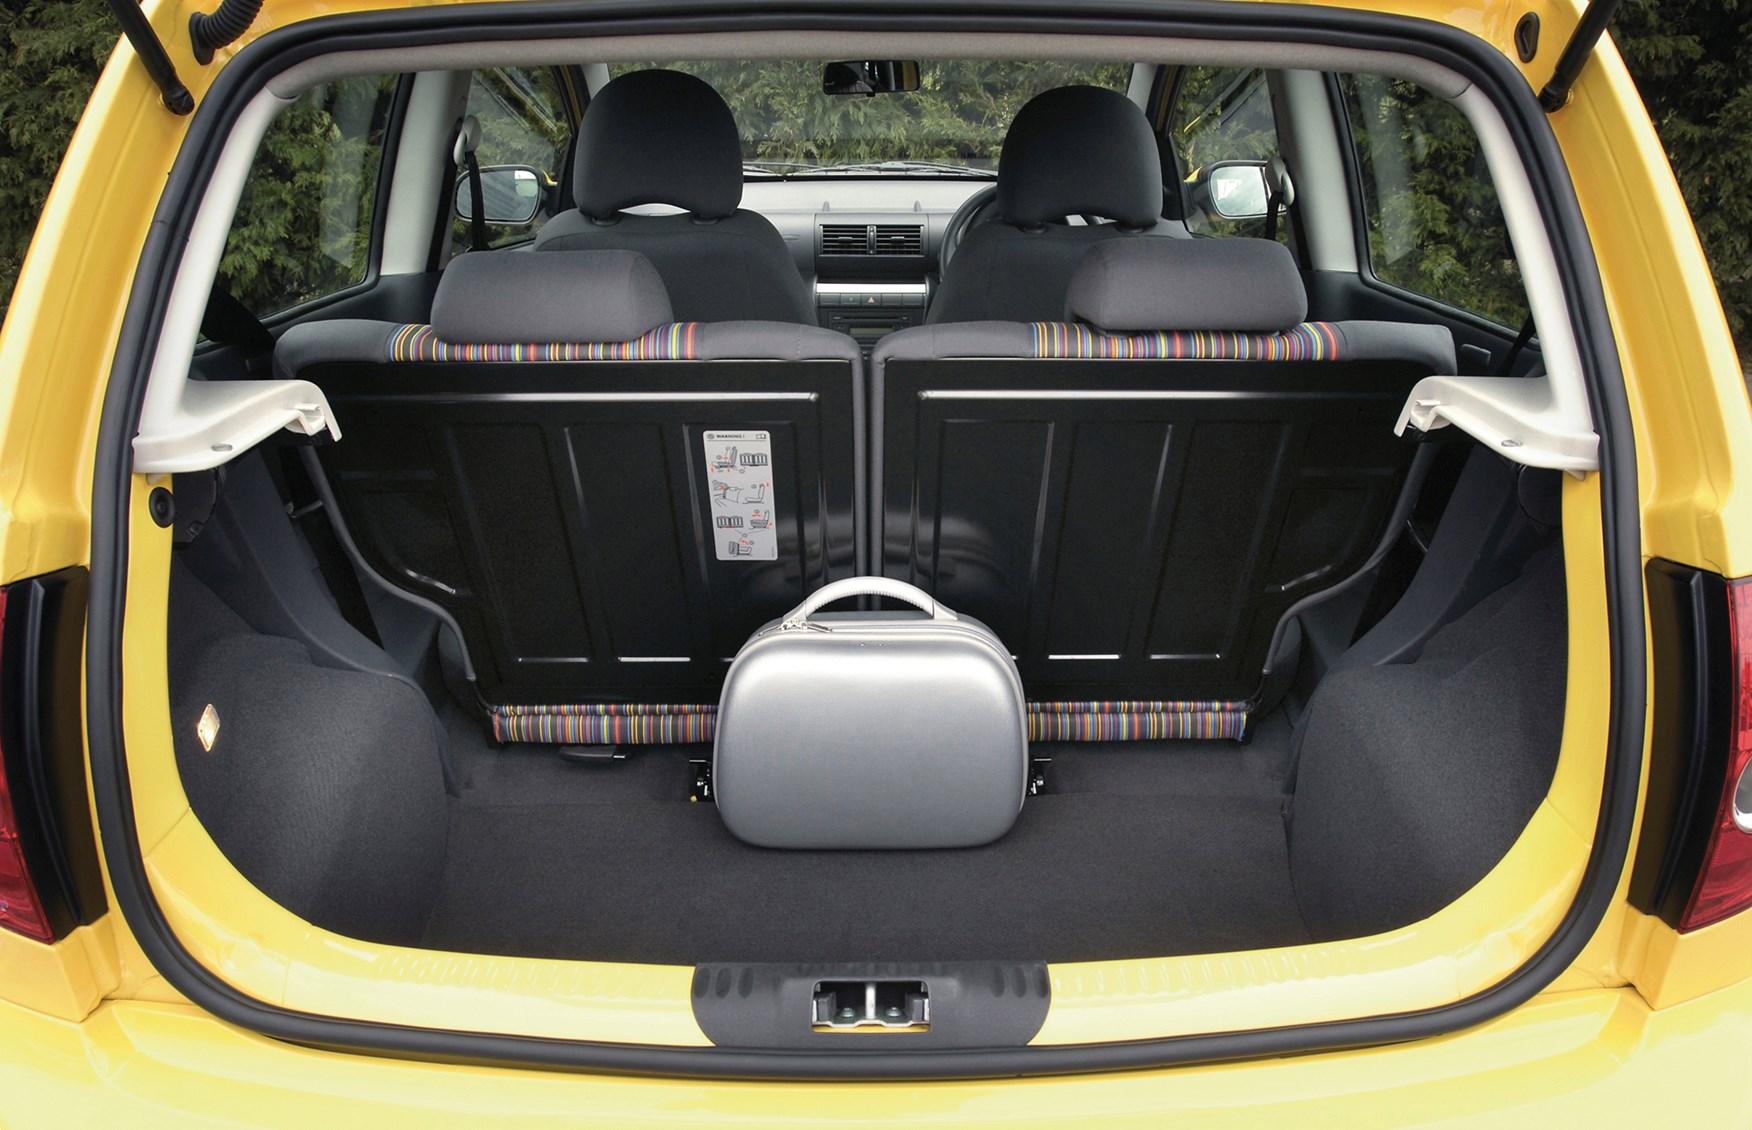 volkswagen fox hatchback 2006 2012 features equipment and accessories parkers. Black Bedroom Furniture Sets. Home Design Ideas